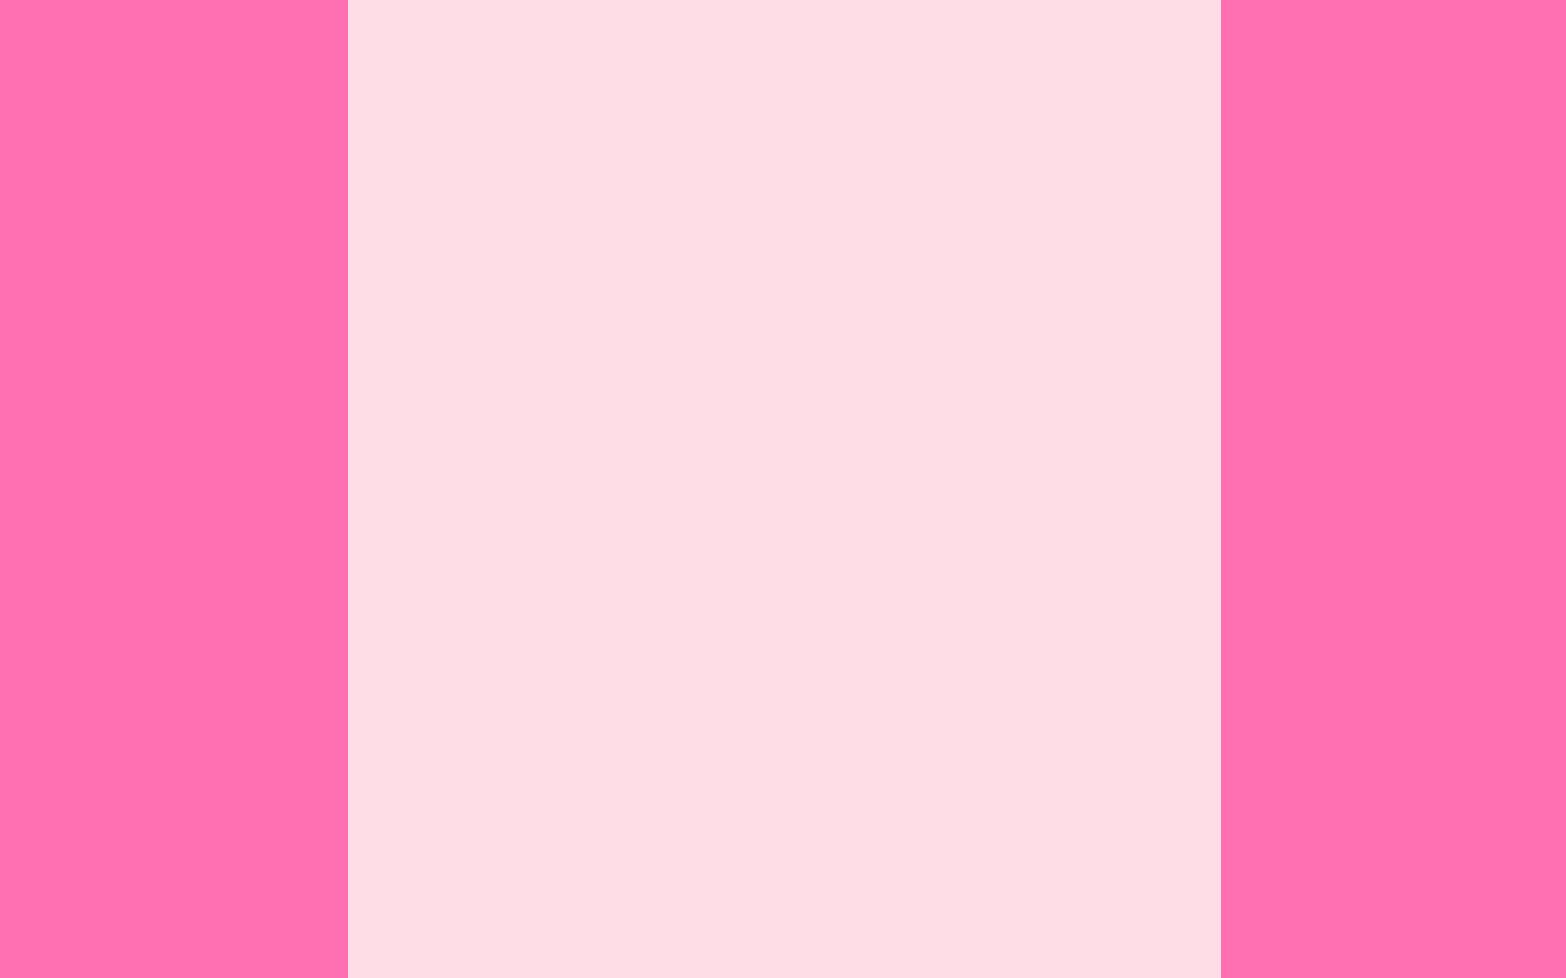 love plain background tumblr - photo #7